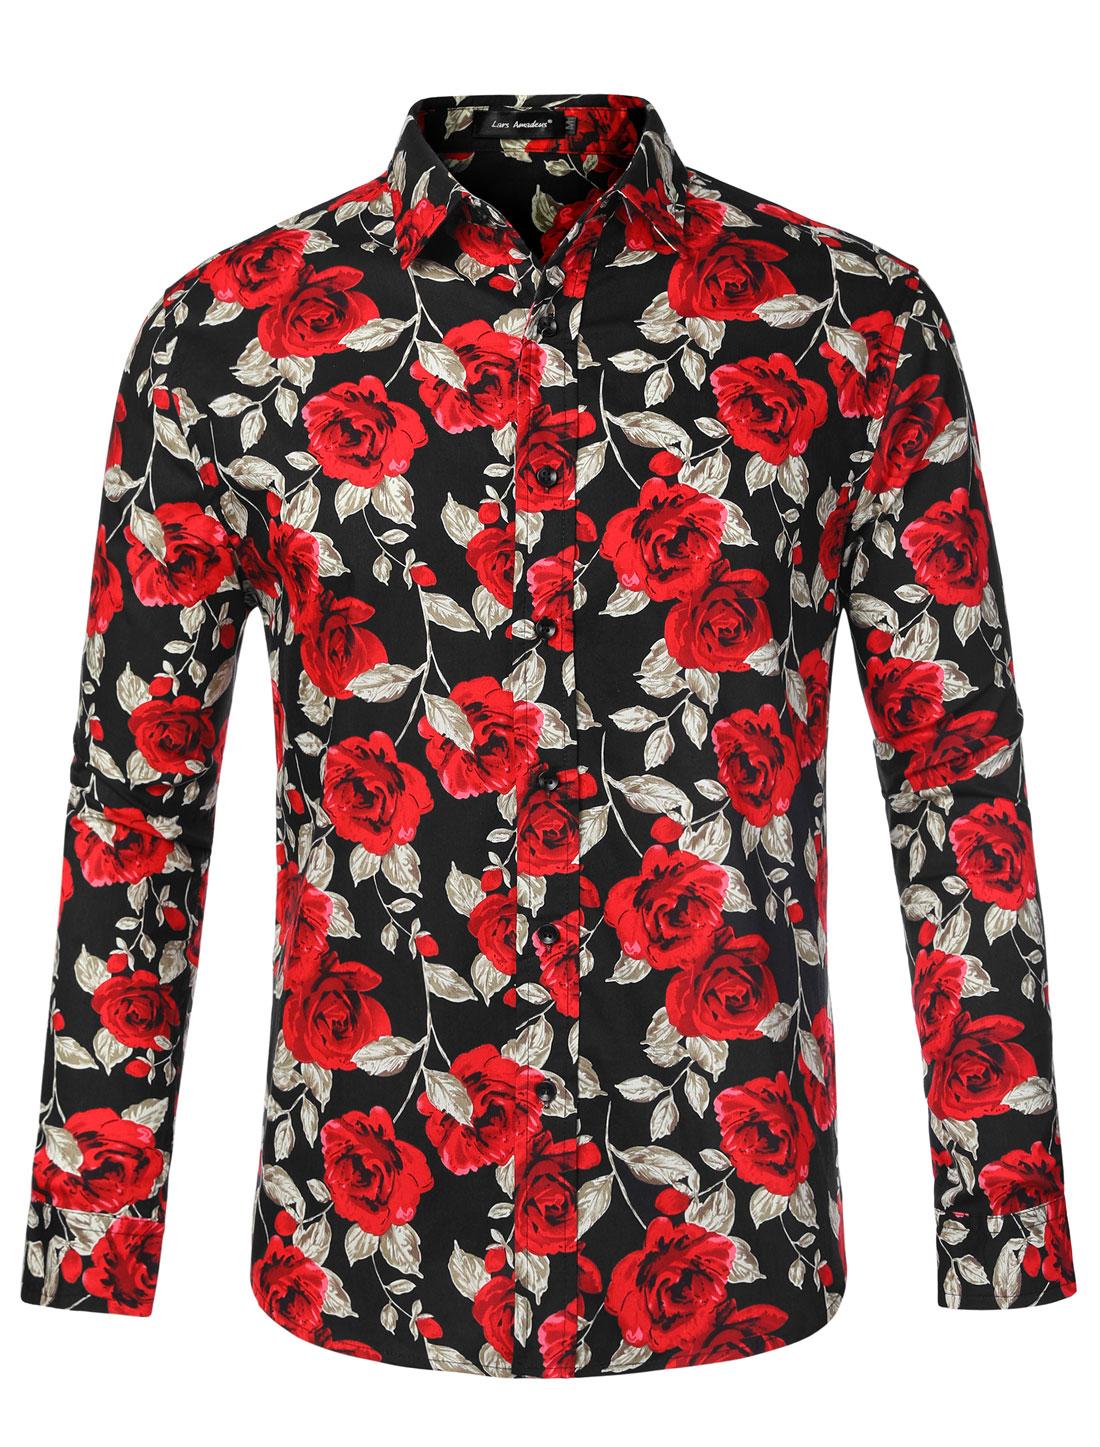 Men Floral Button Down Hawaiian Palm Flower Printed Shirt Black Rose XL